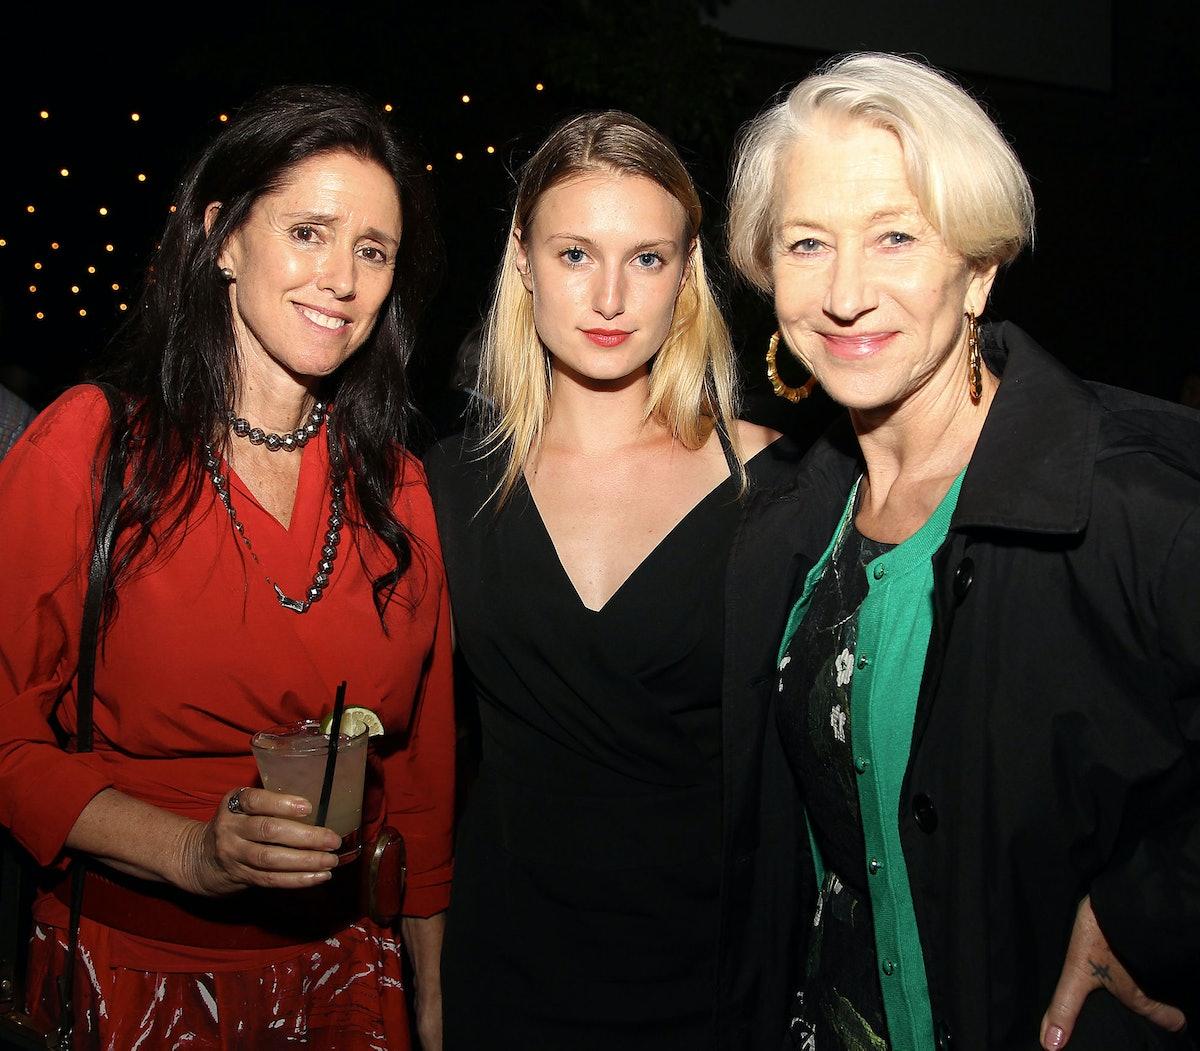 Julie Taymor, Lilly Englert and Helen Mirren